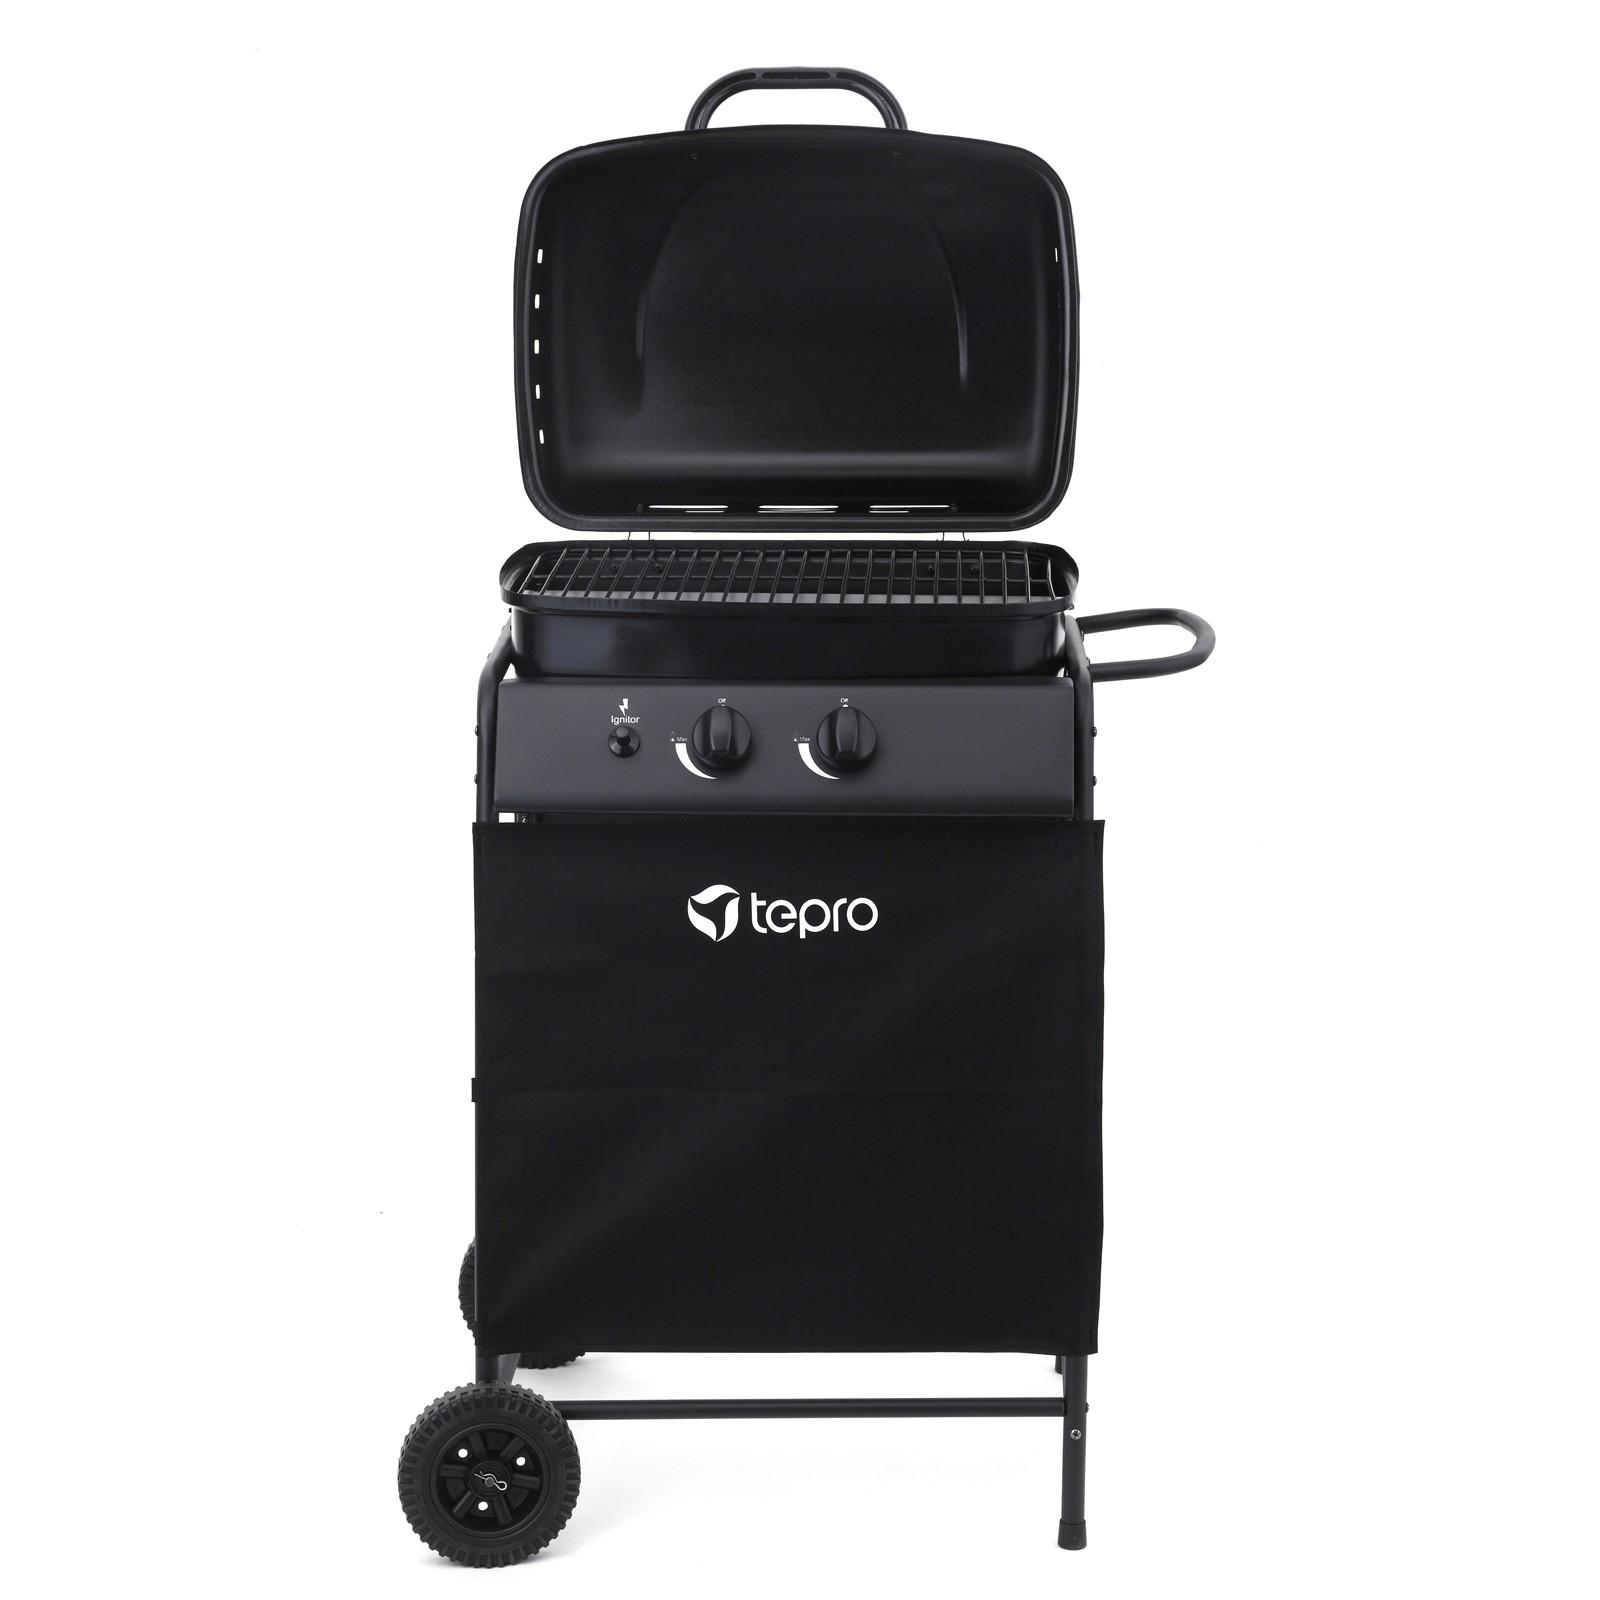 tepro gasgrill 2 brenner delton grillwagen garten outdoor. Black Bedroom Furniture Sets. Home Design Ideas